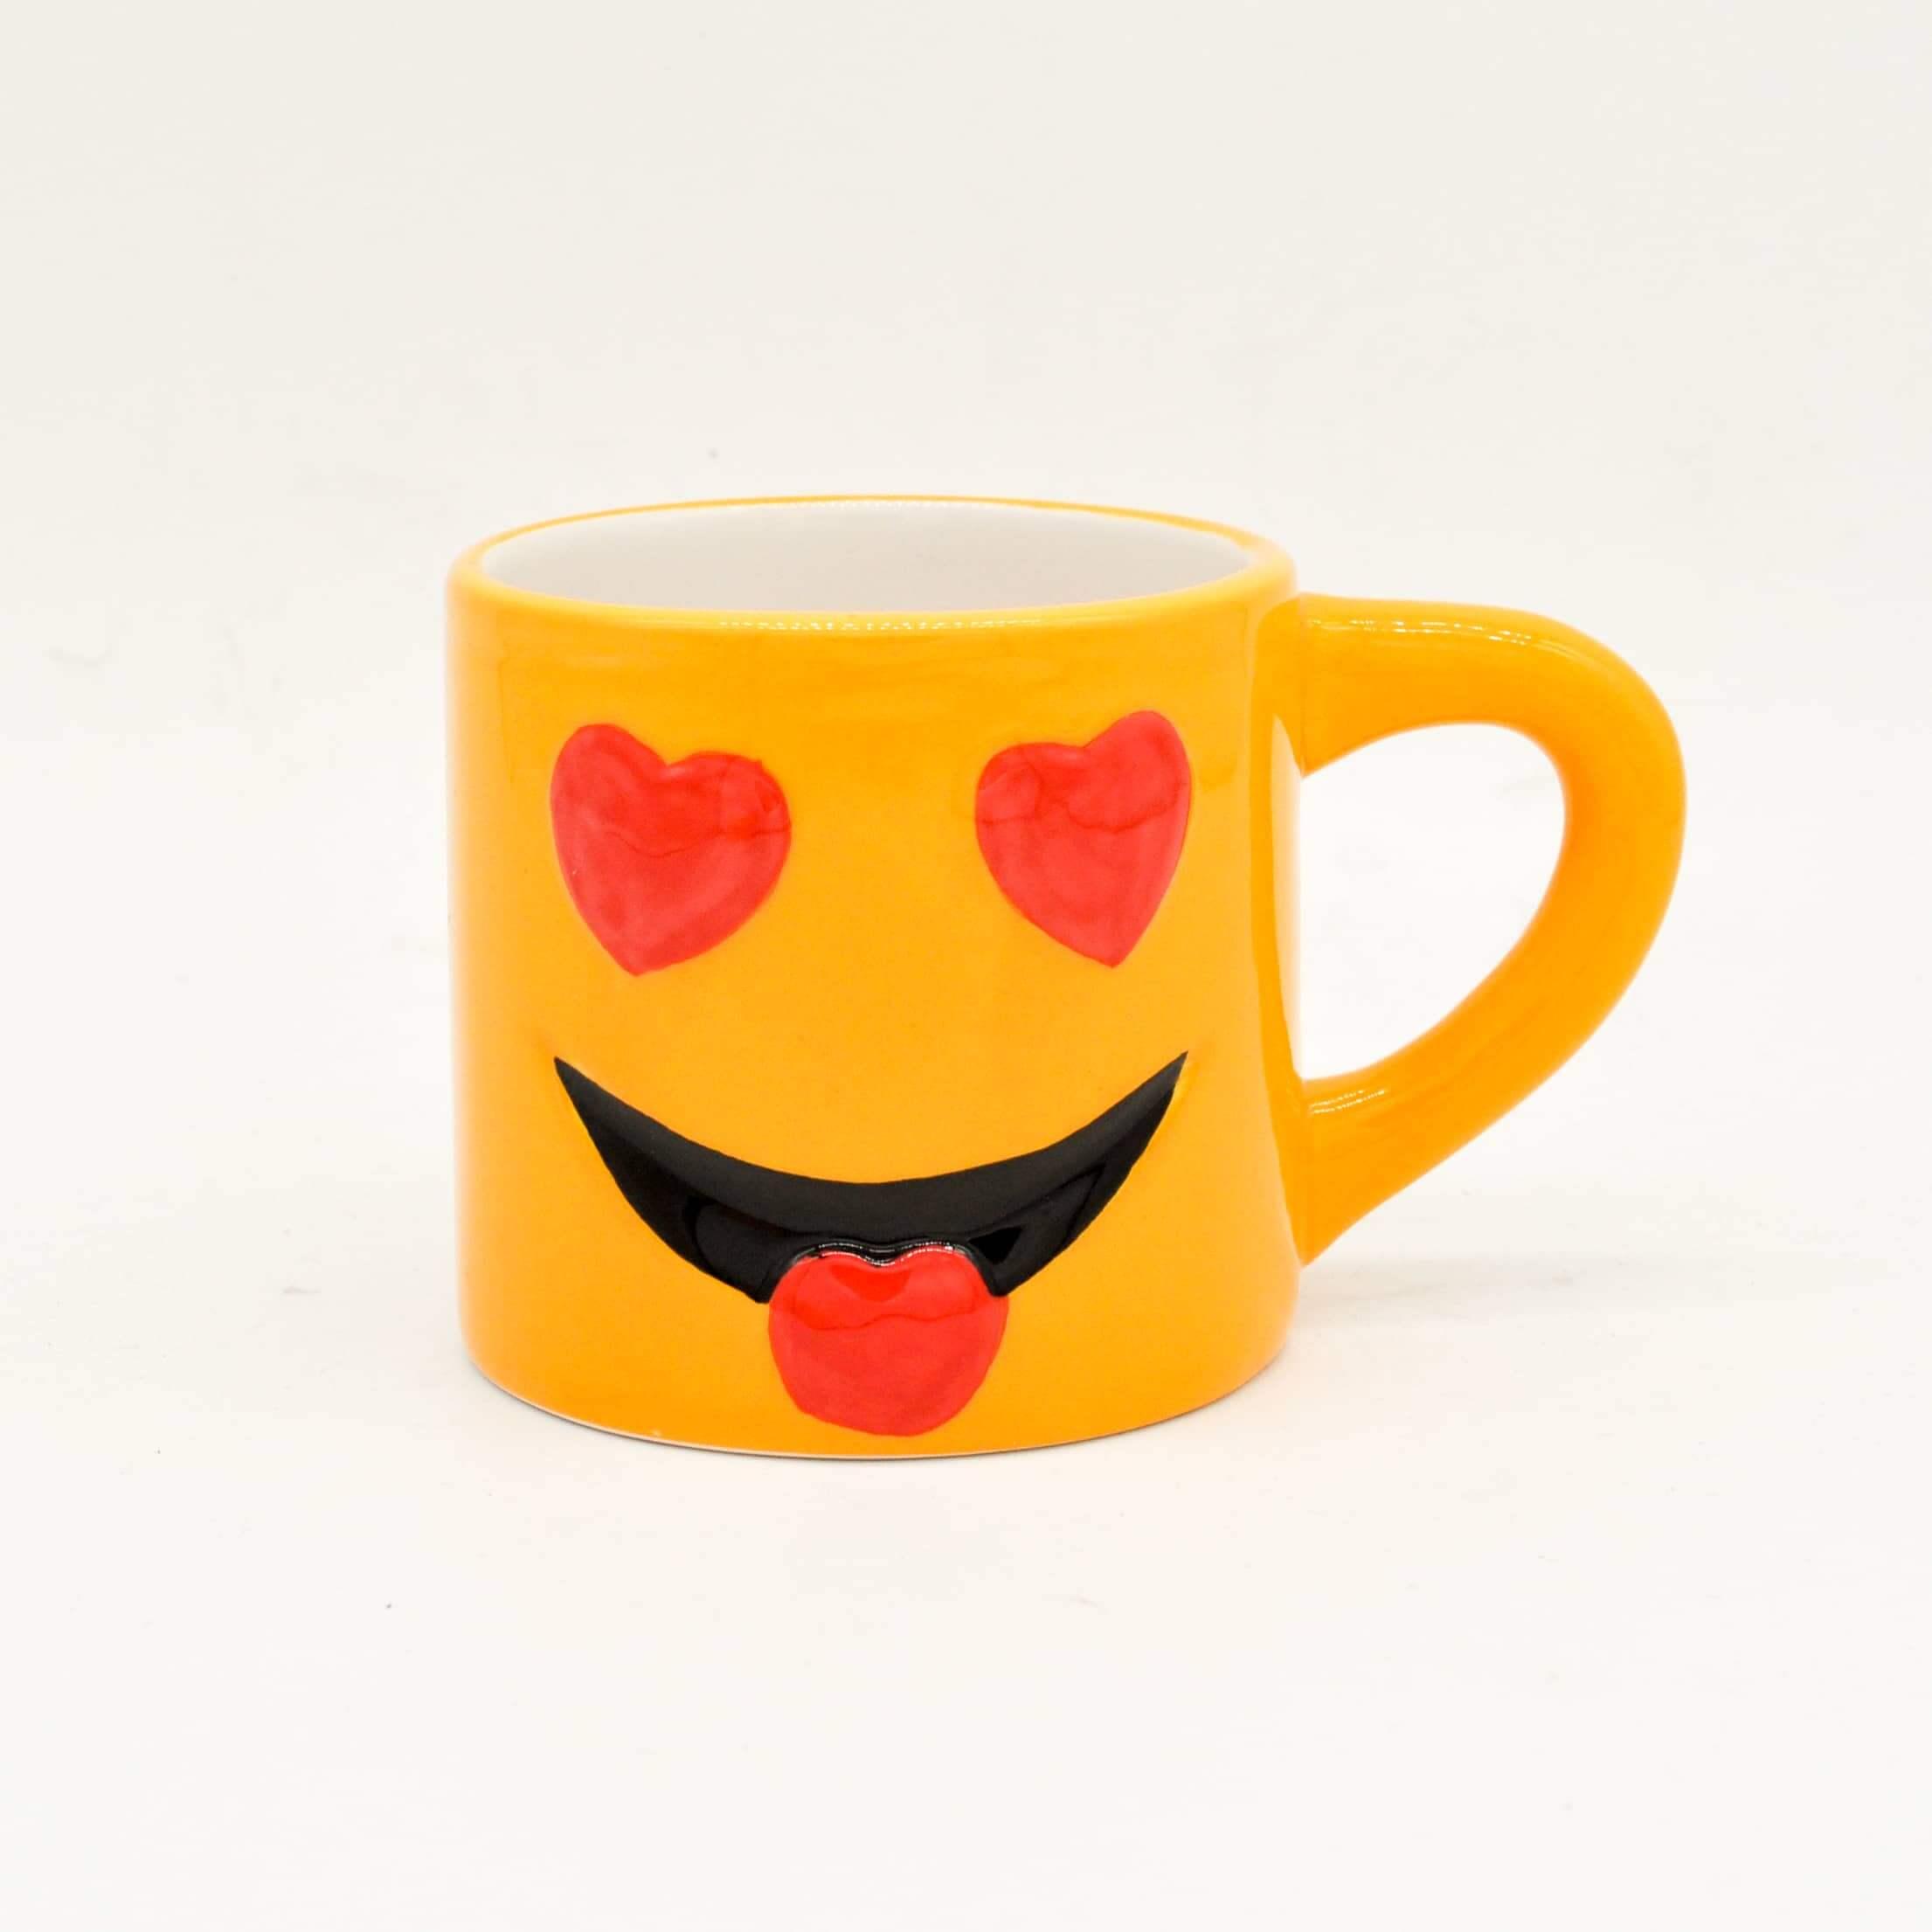 8oz Emoji coffee mug  Yongchuan Ceramics CoLtd